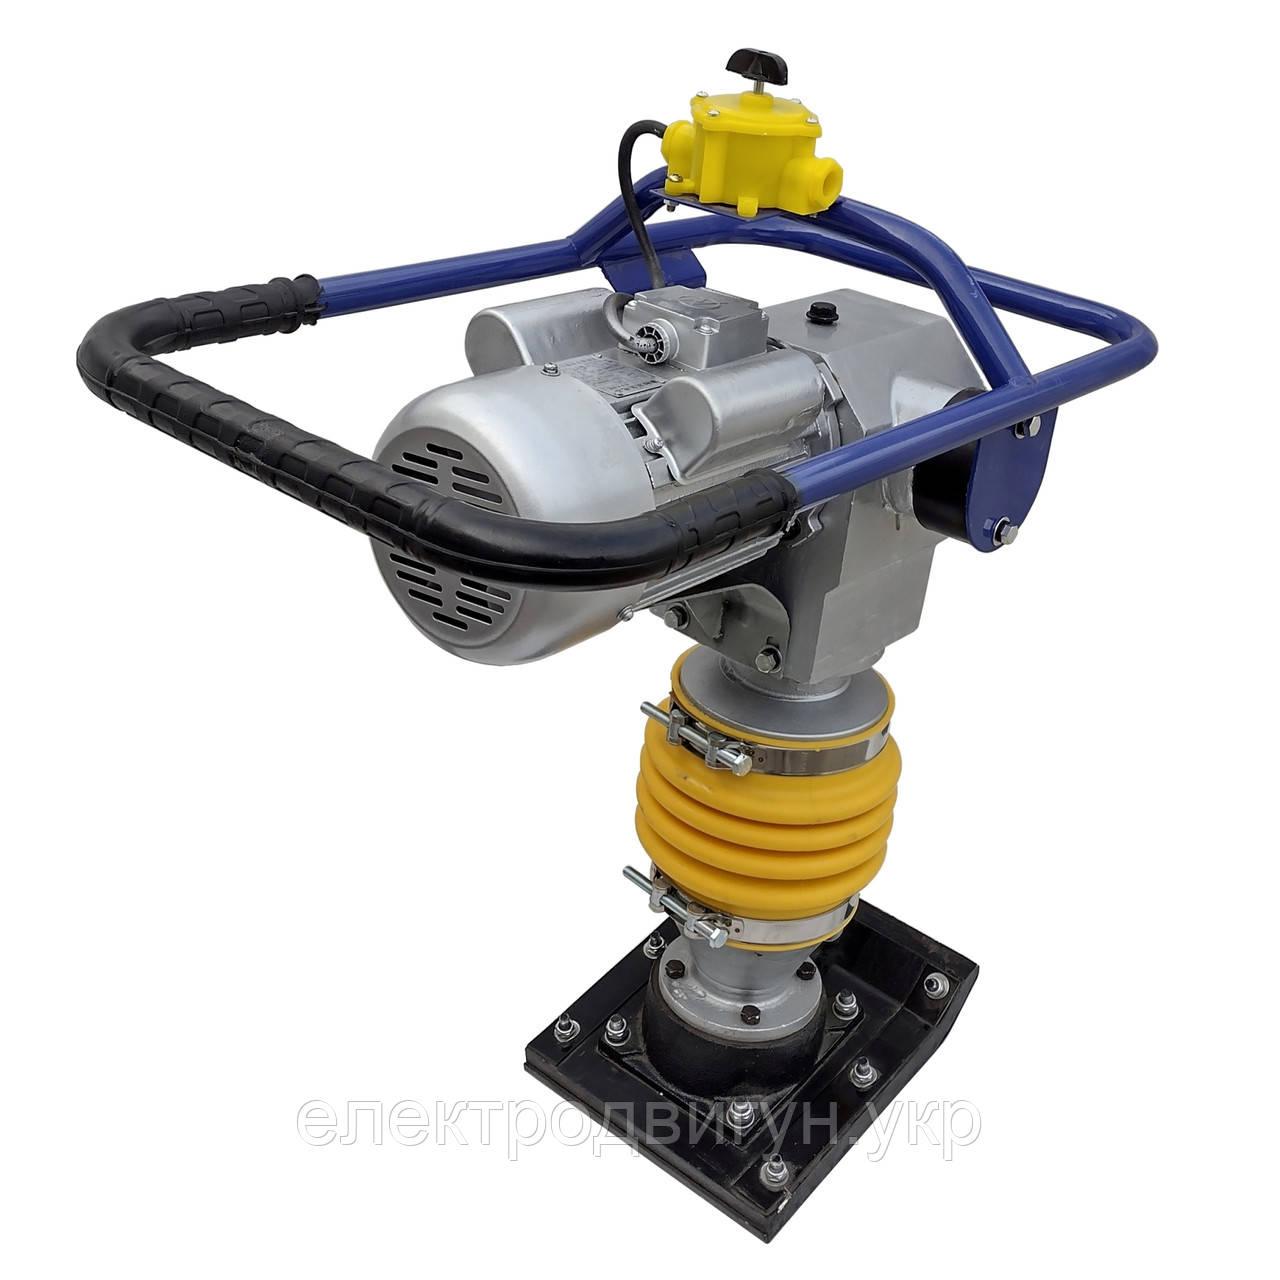 Вібротрамбовка (Вибронога) електрична HCD-90